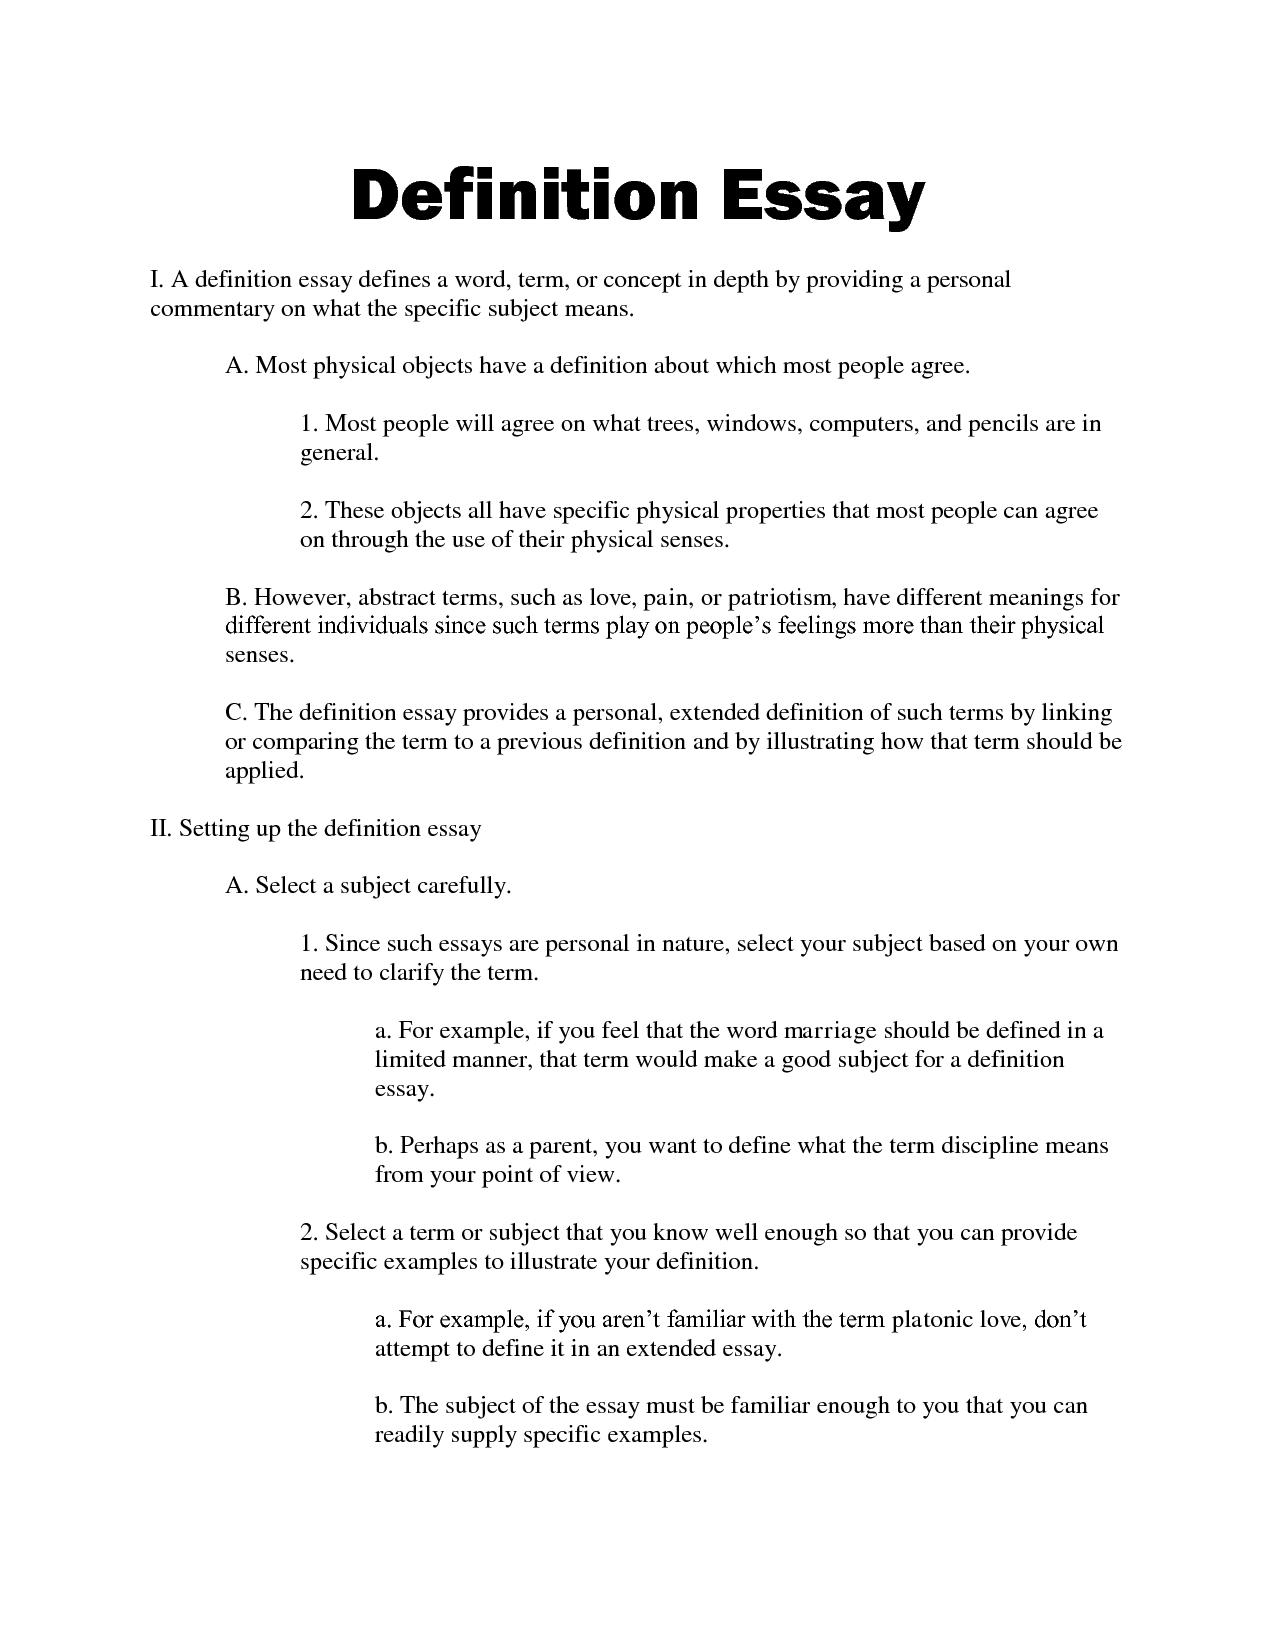 006 Definition Essay Topics Gj60o8orim Striking List For College Students Full